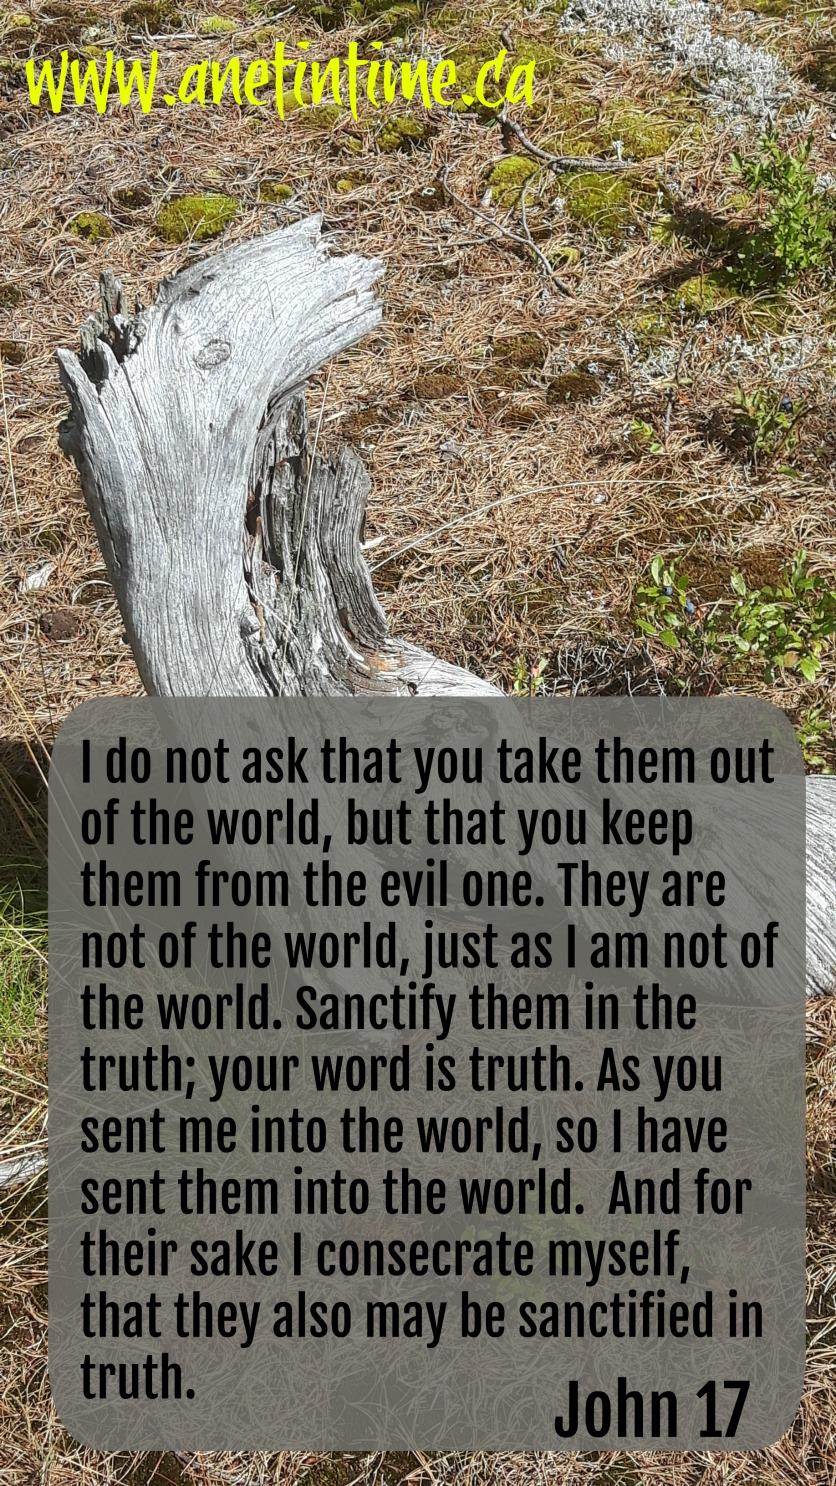 John 17 High Priestly Prayer